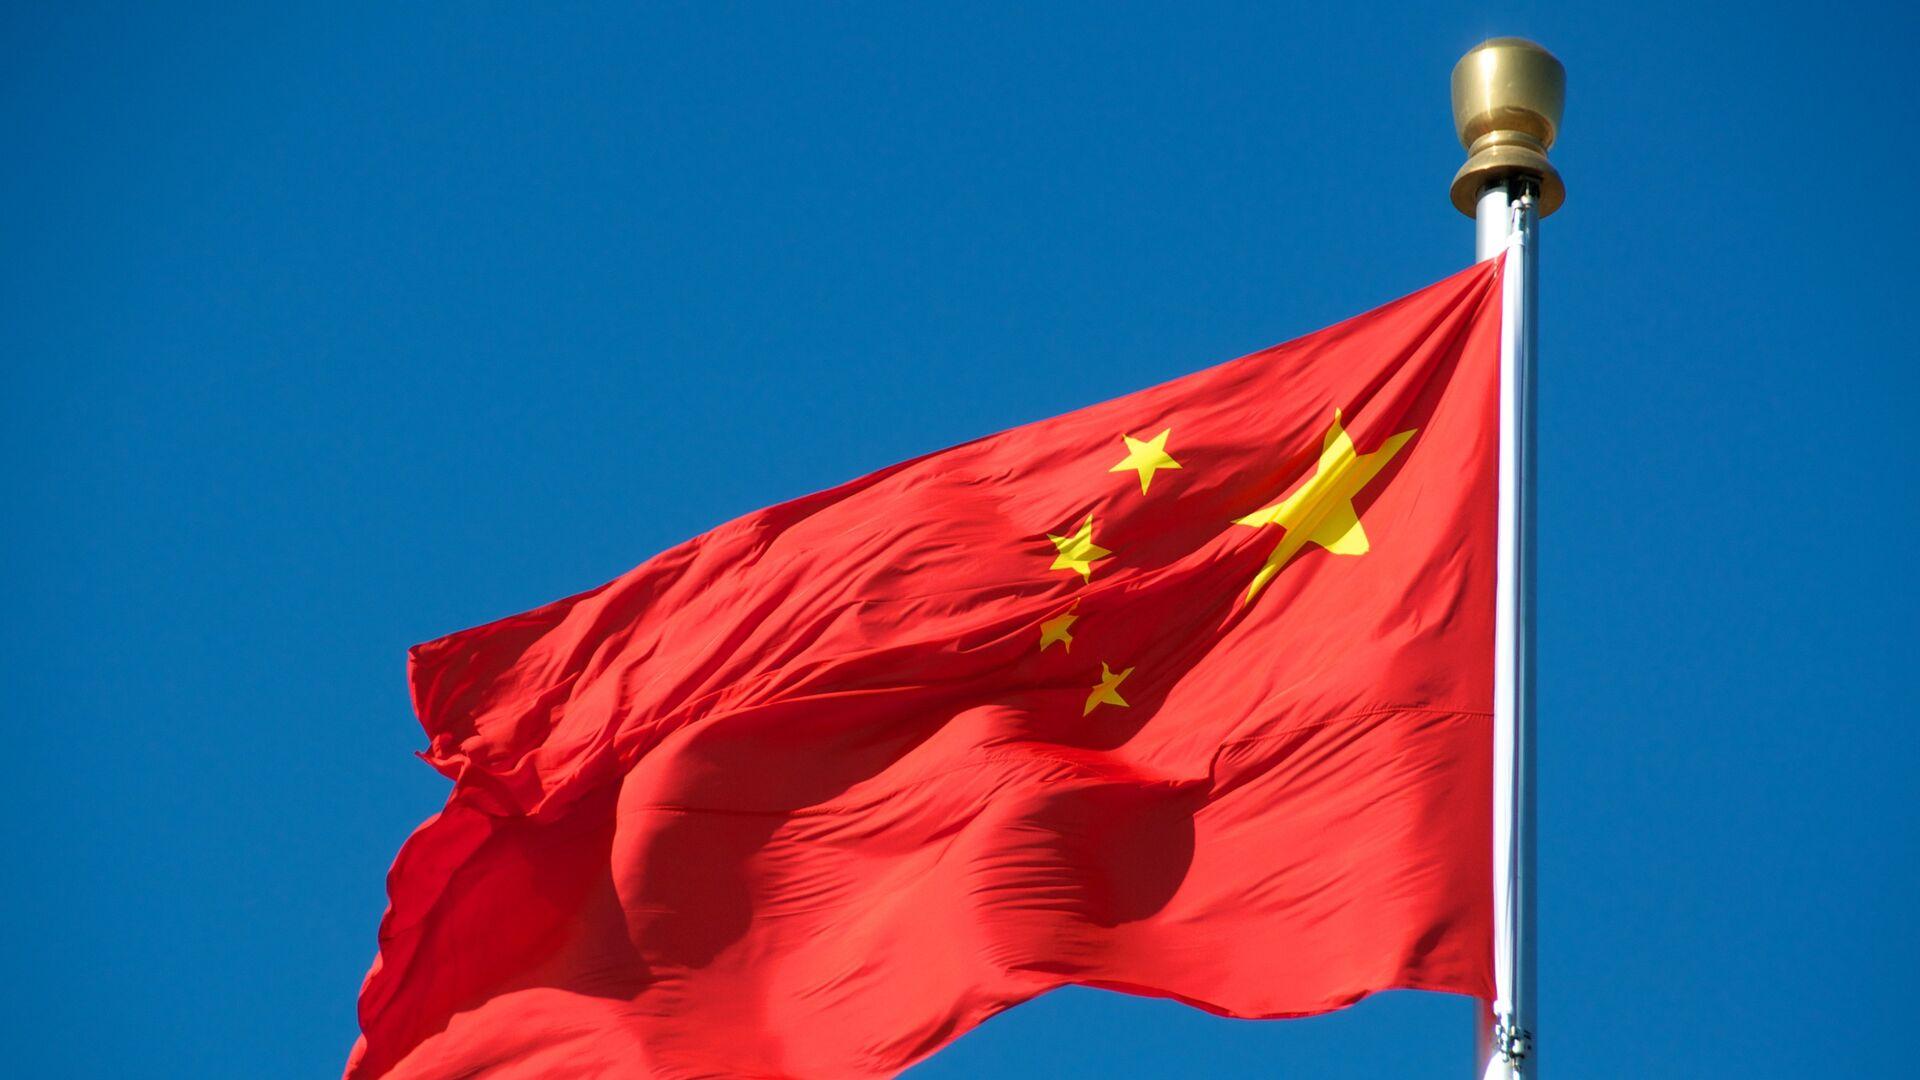 La bandera de China - Sputnik Mundo, 1920, 10.08.2021